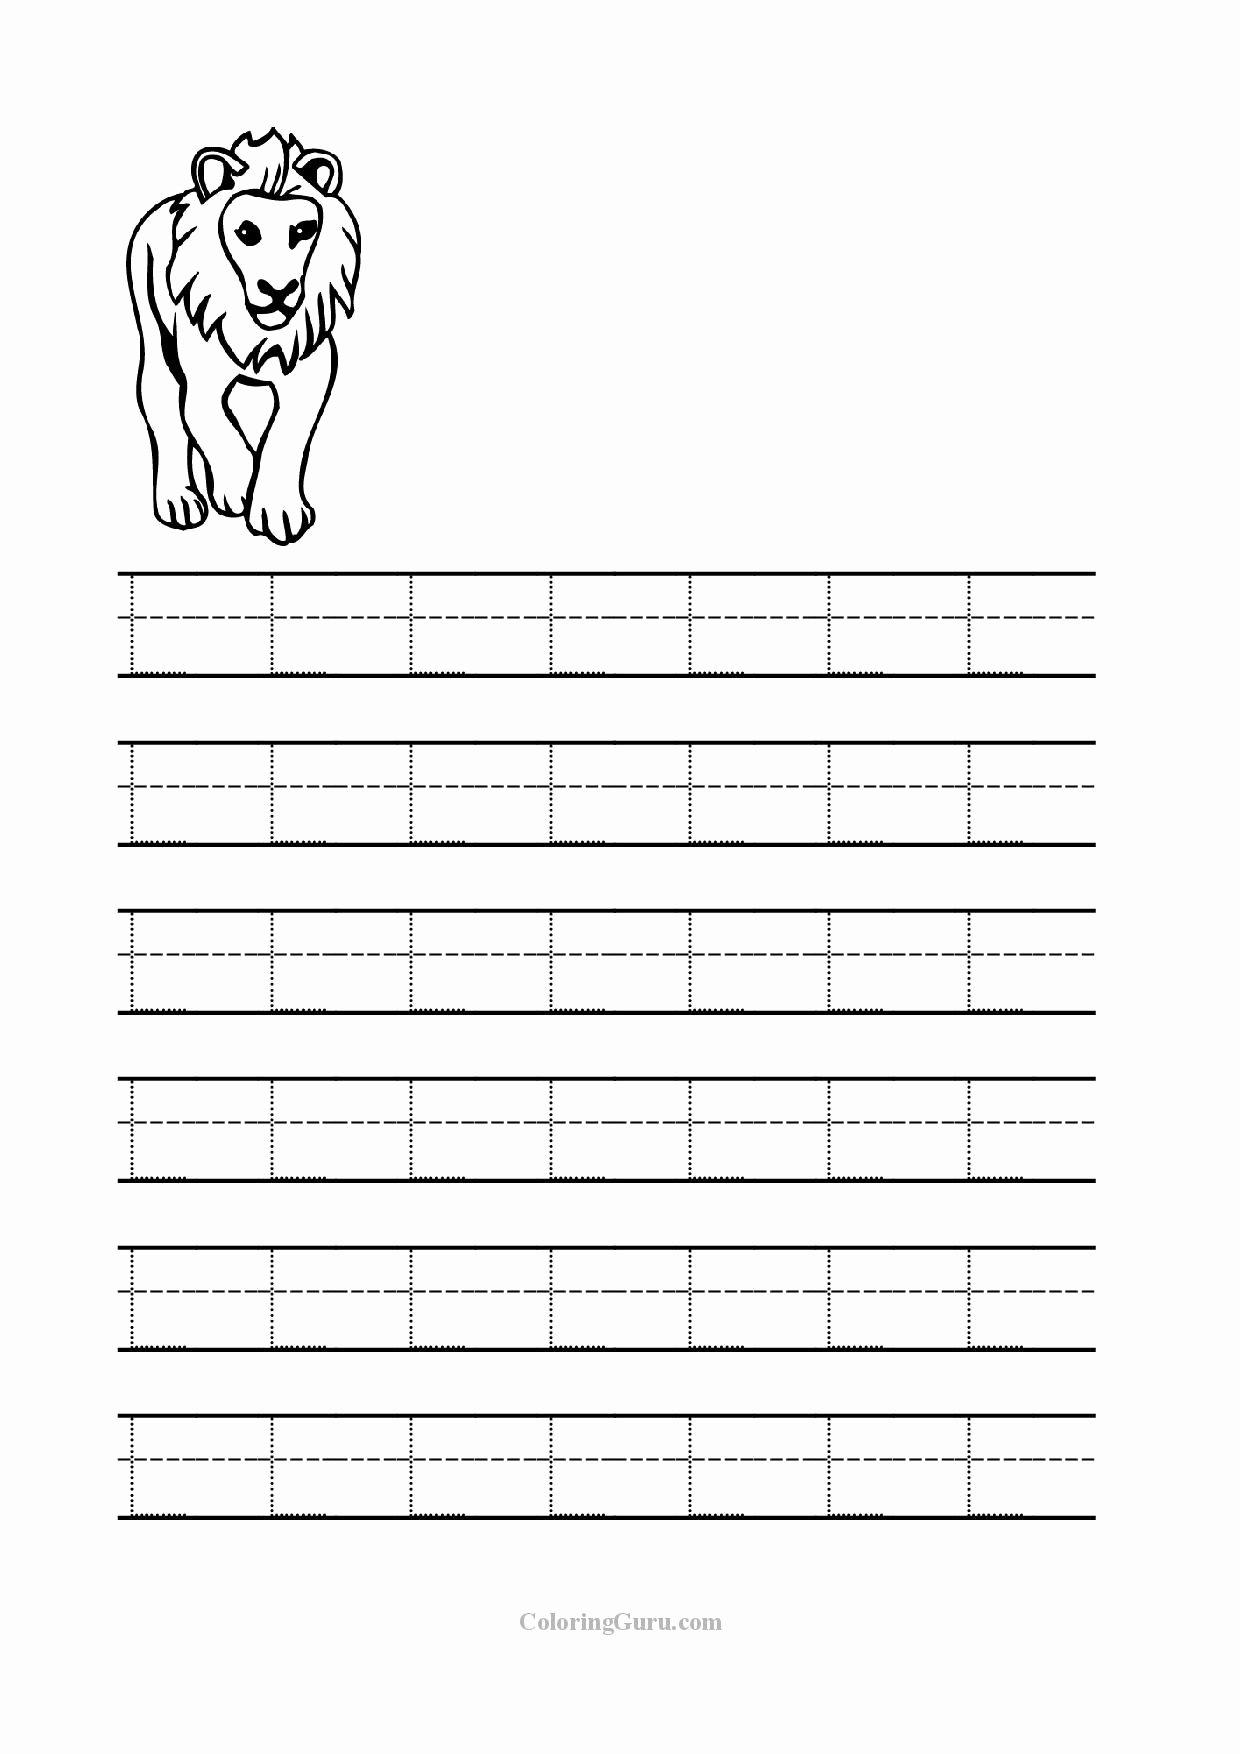 Free Printable Letter L Worksheets for Preschoolers Fresh Free Printable Tracing Letter L Worksheets for Preschool